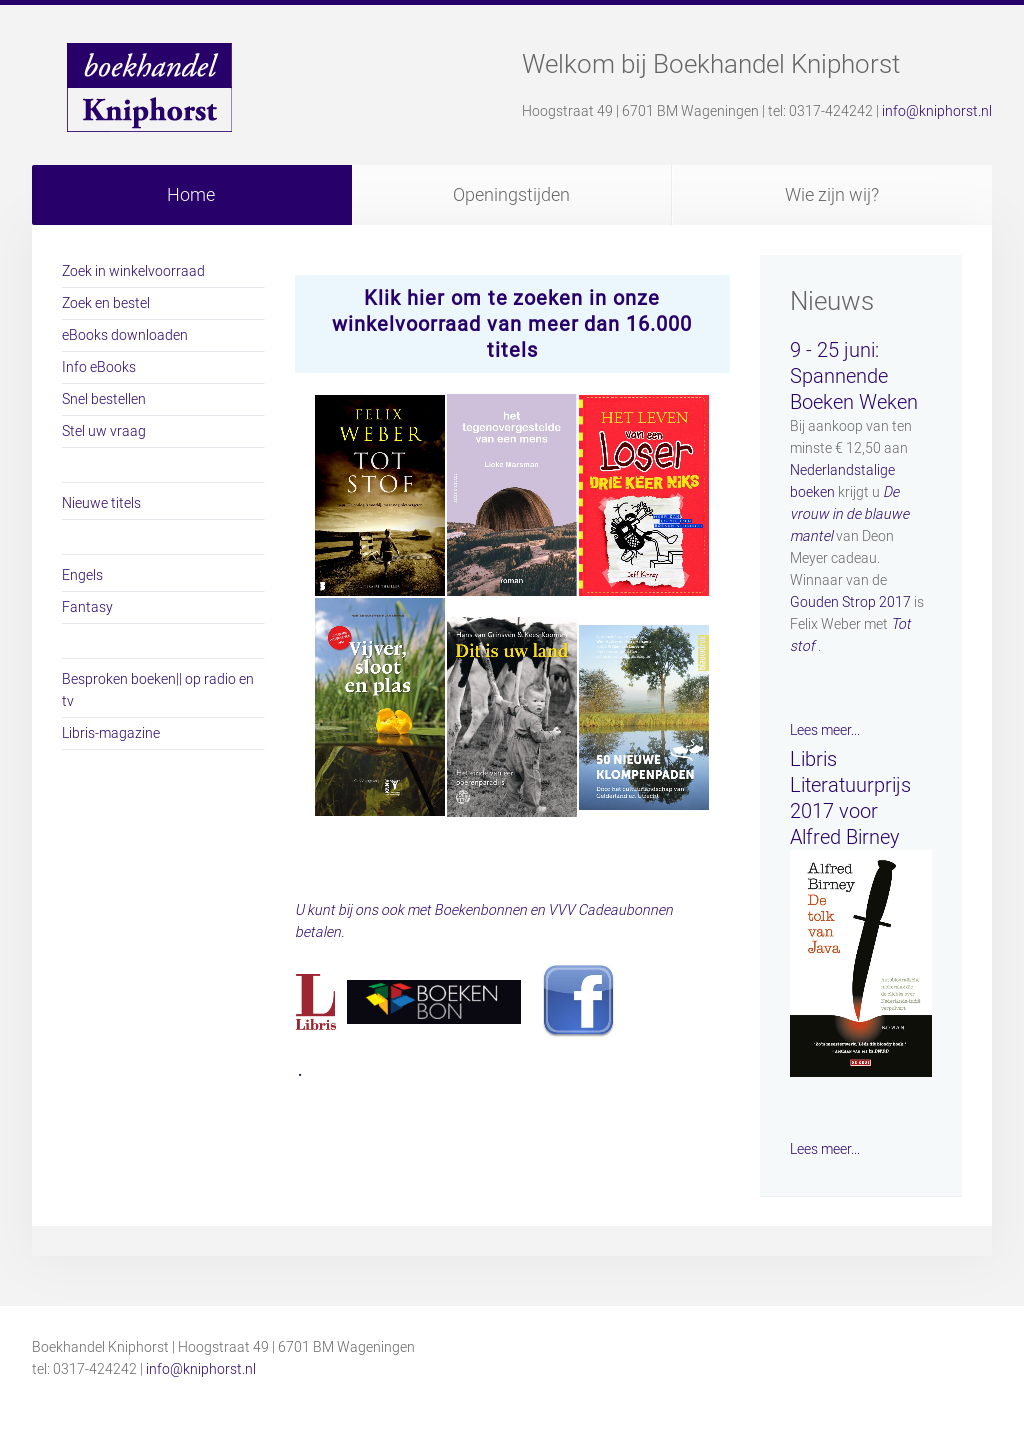 boekhandel kniphorst